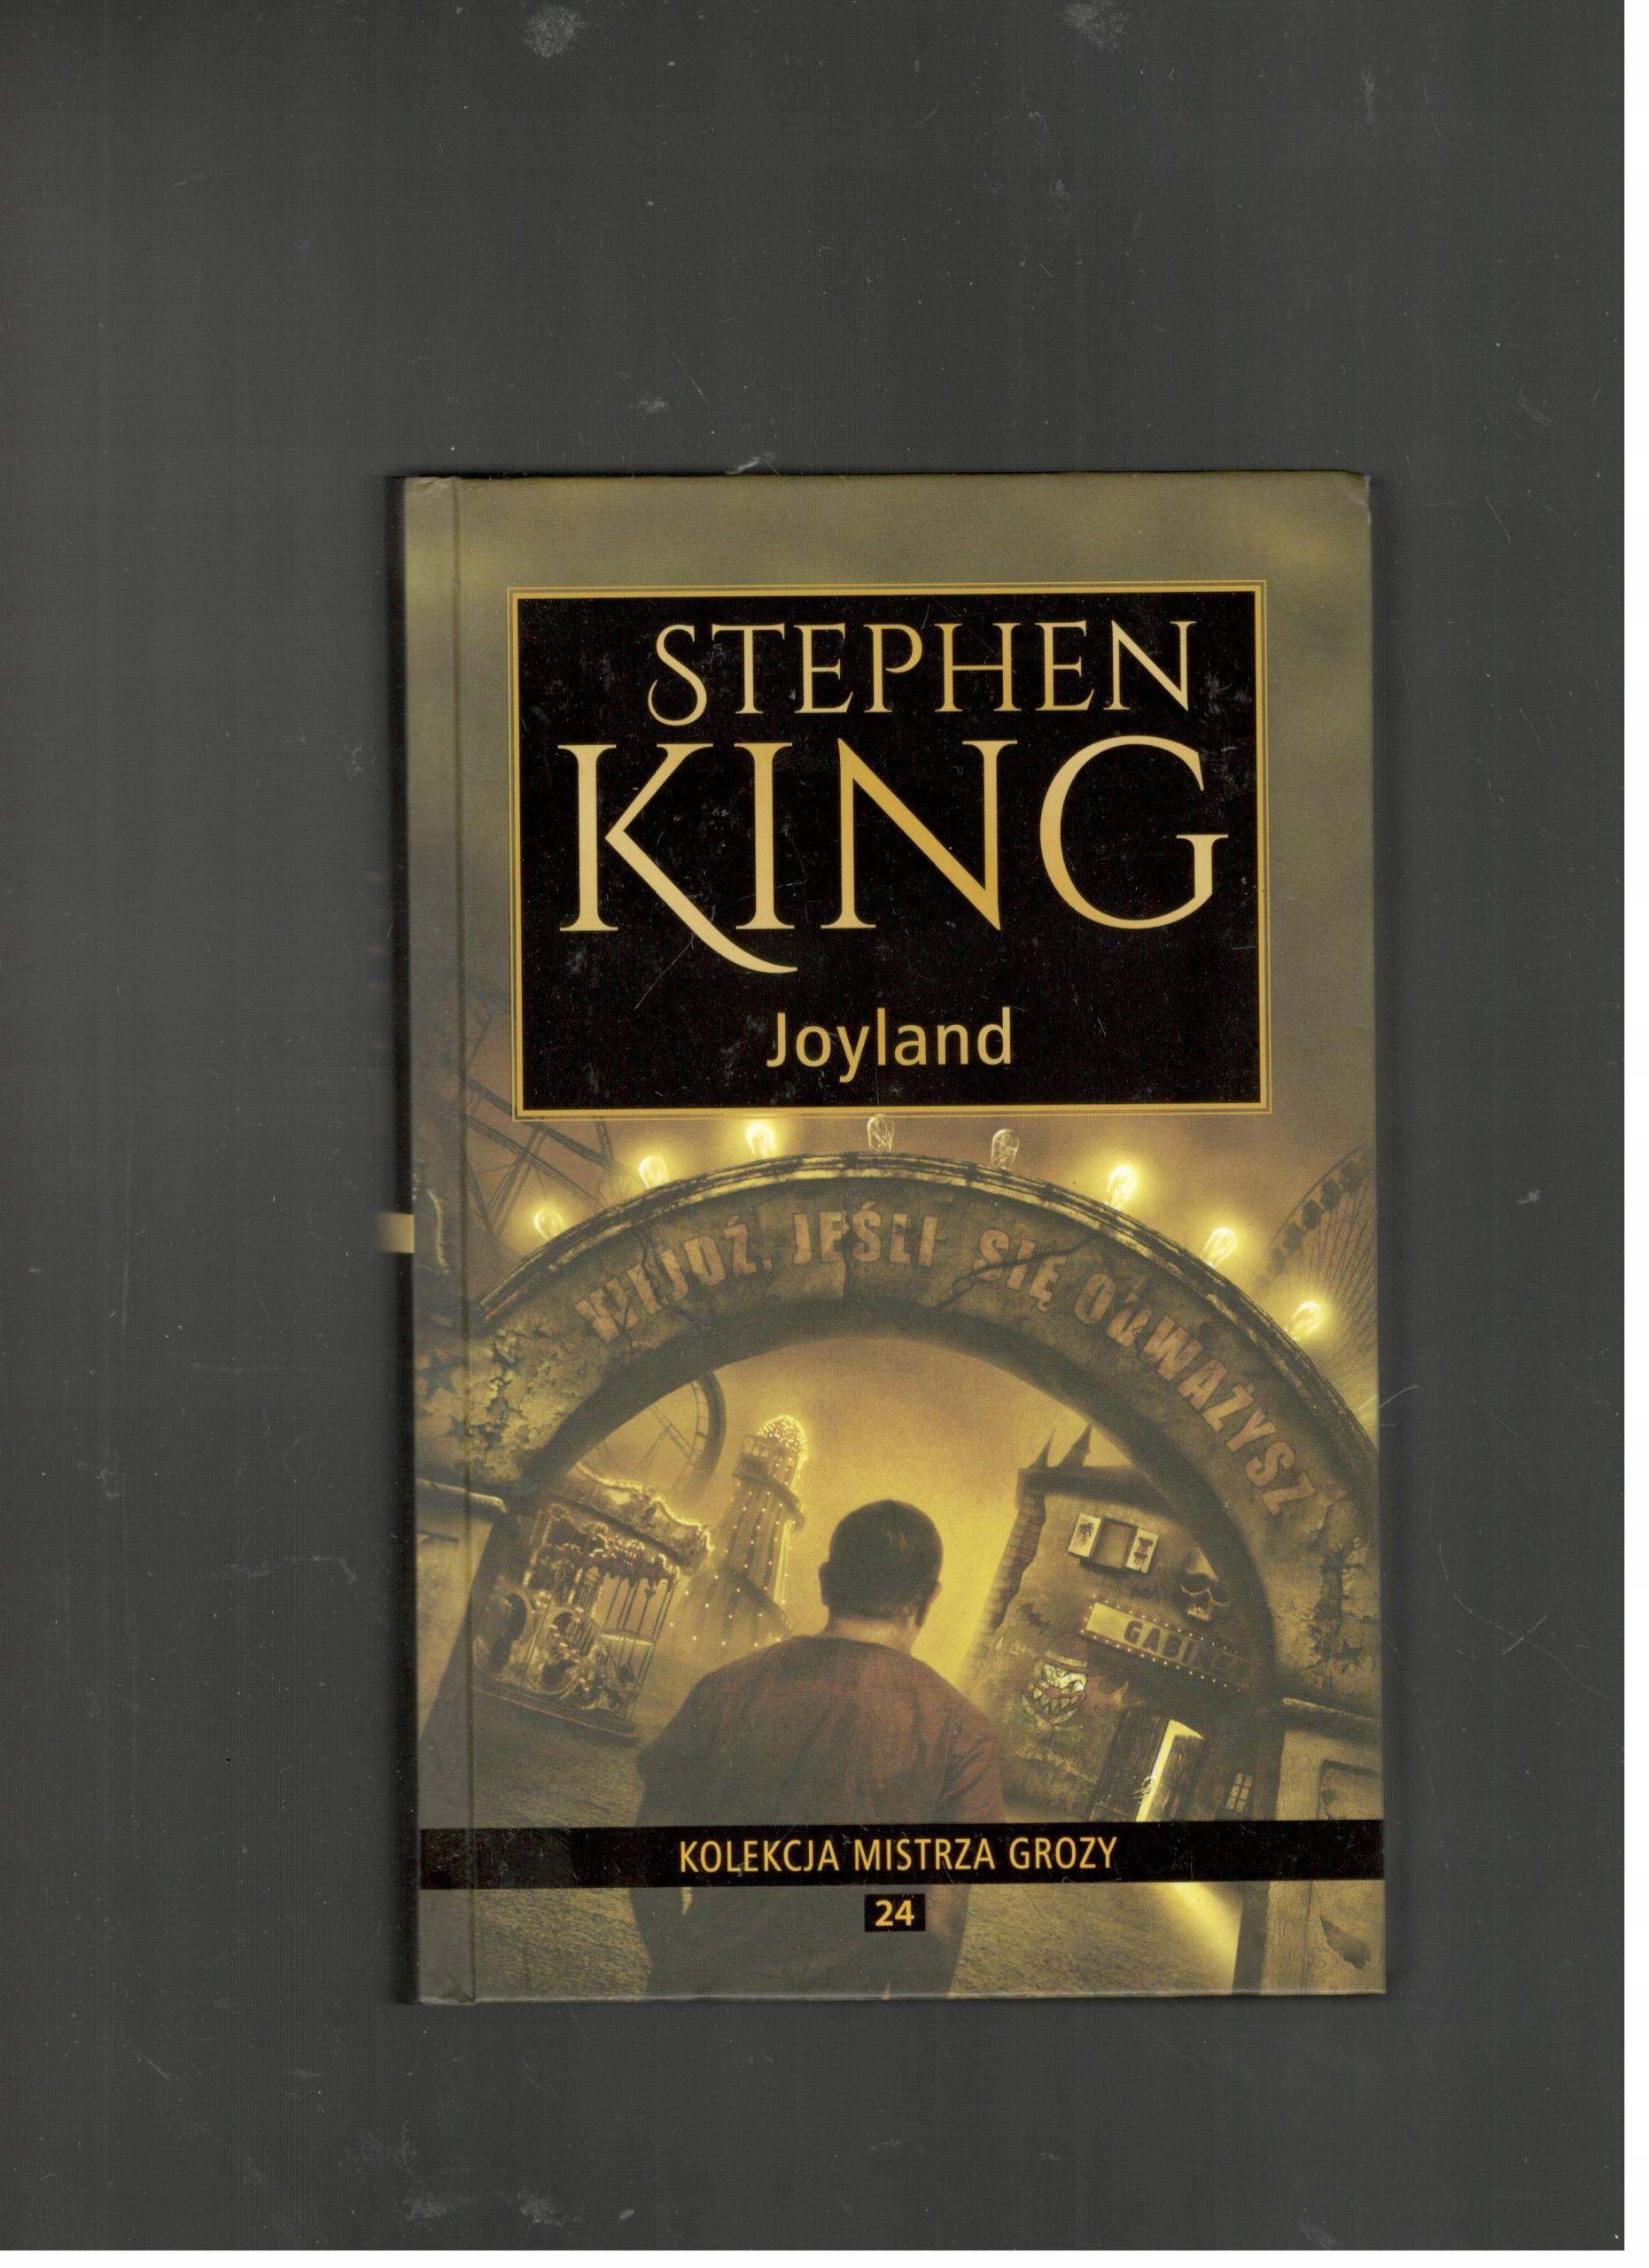 JOYLAND STEPHEN KING - 9,99 ZŁ